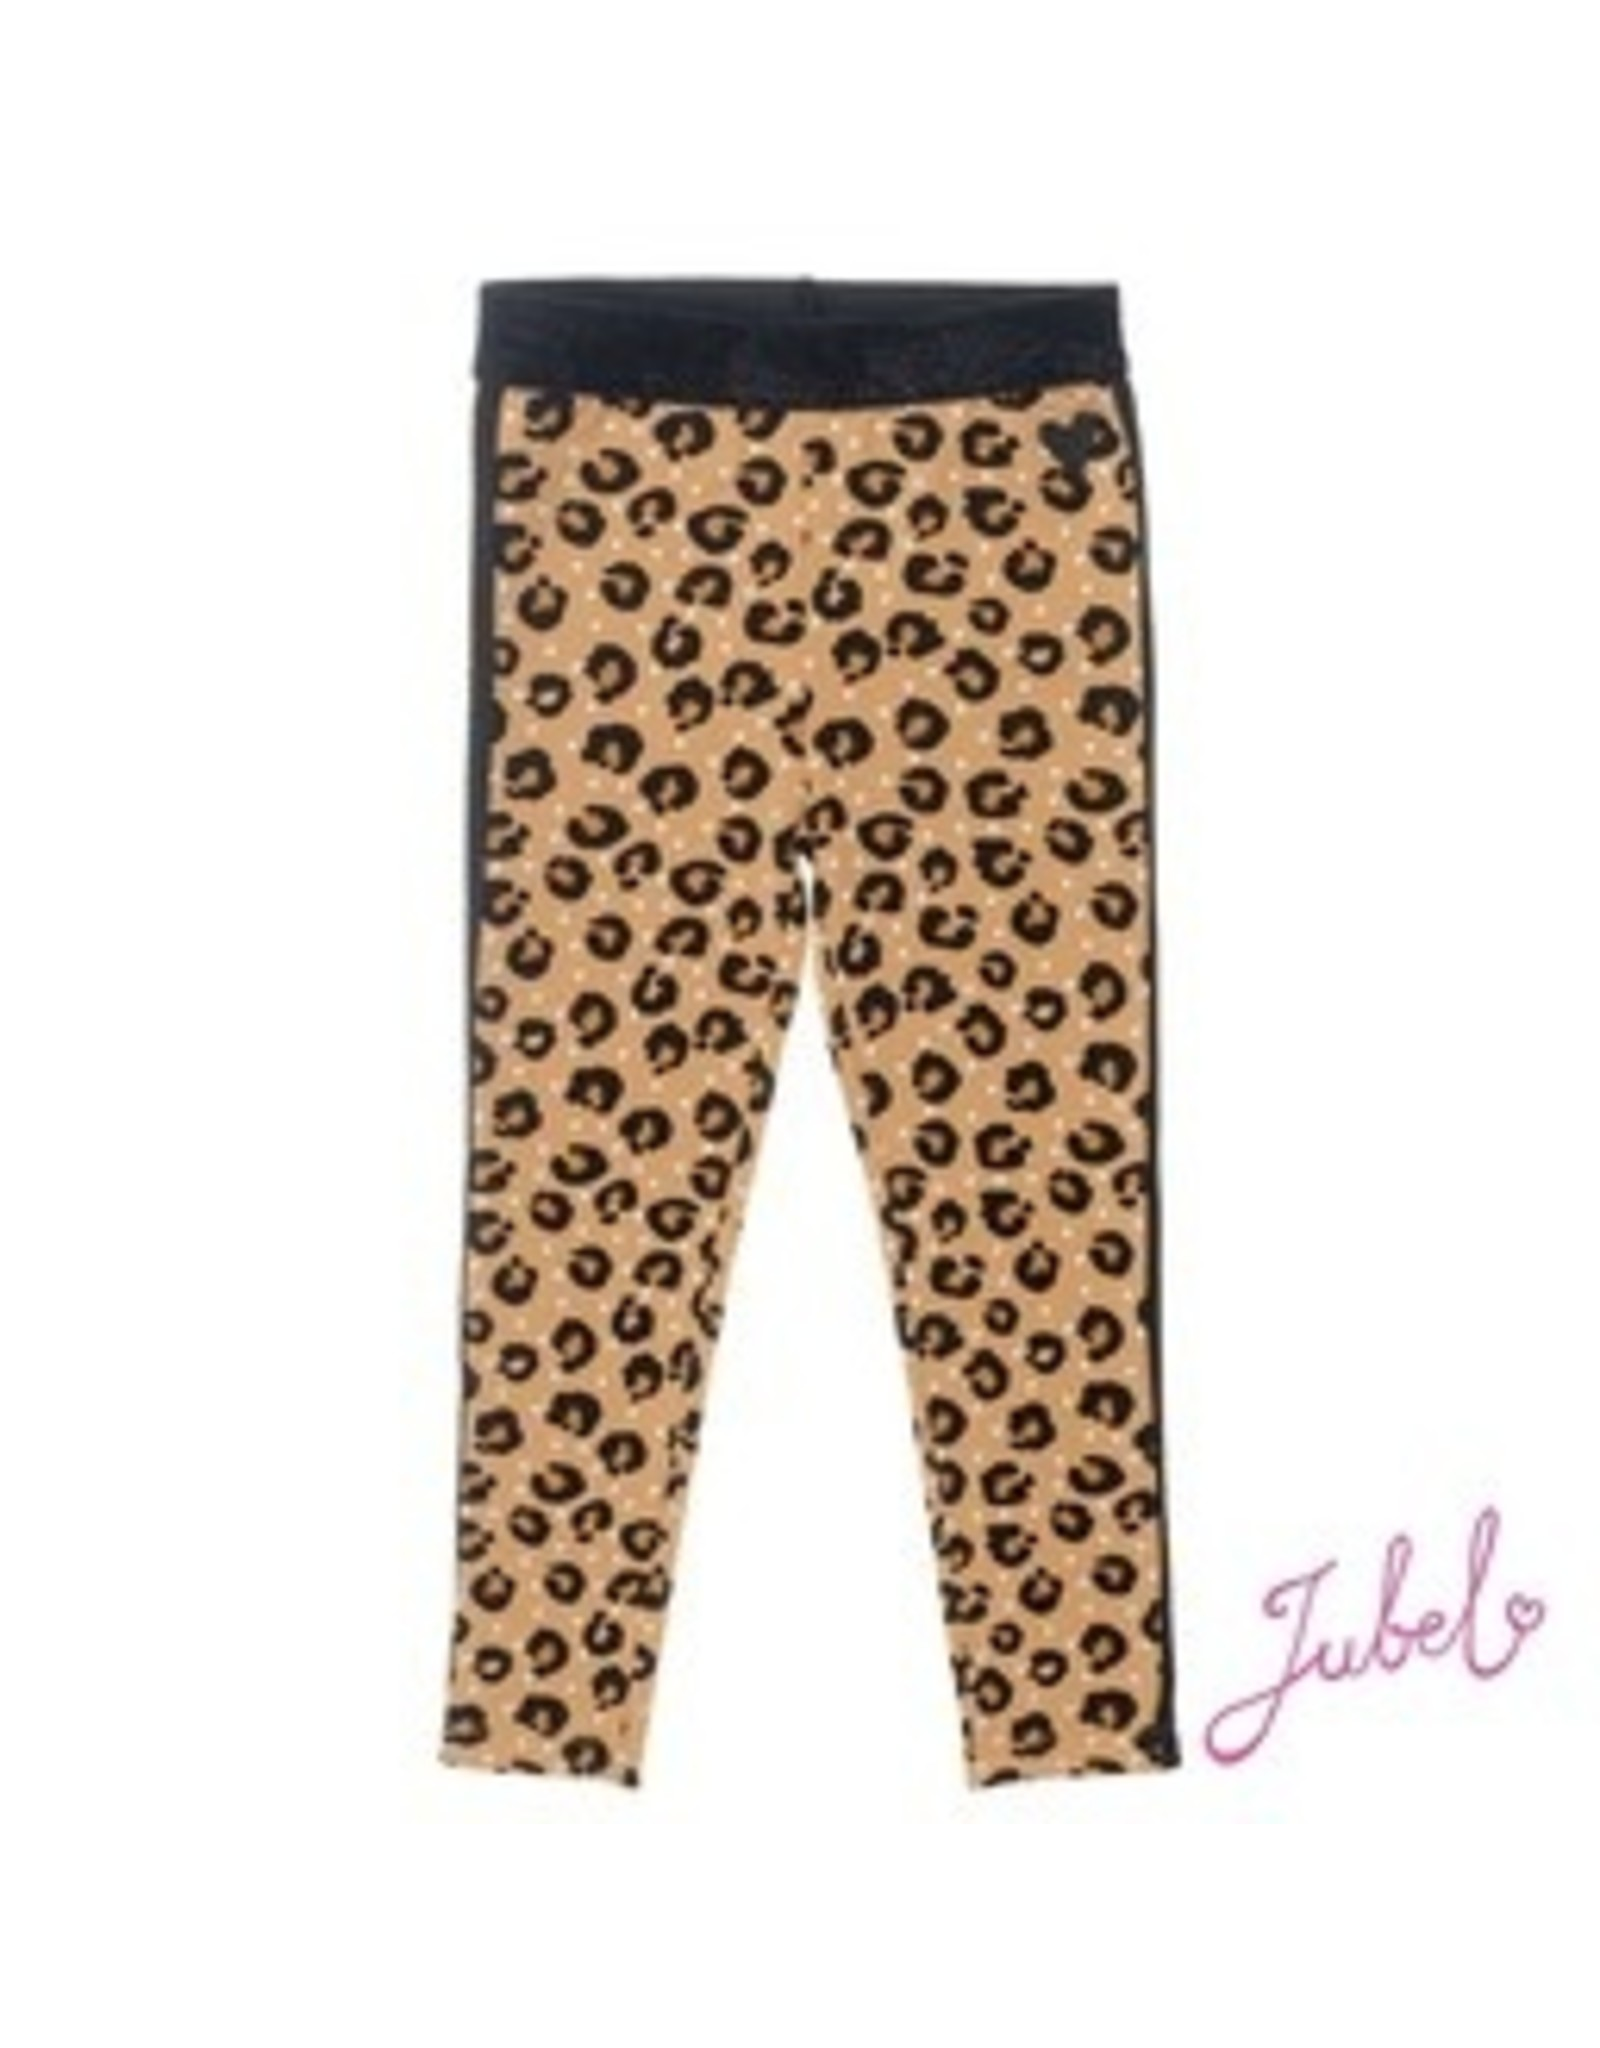 Jubel Legging AOP - Leopard Lipstick